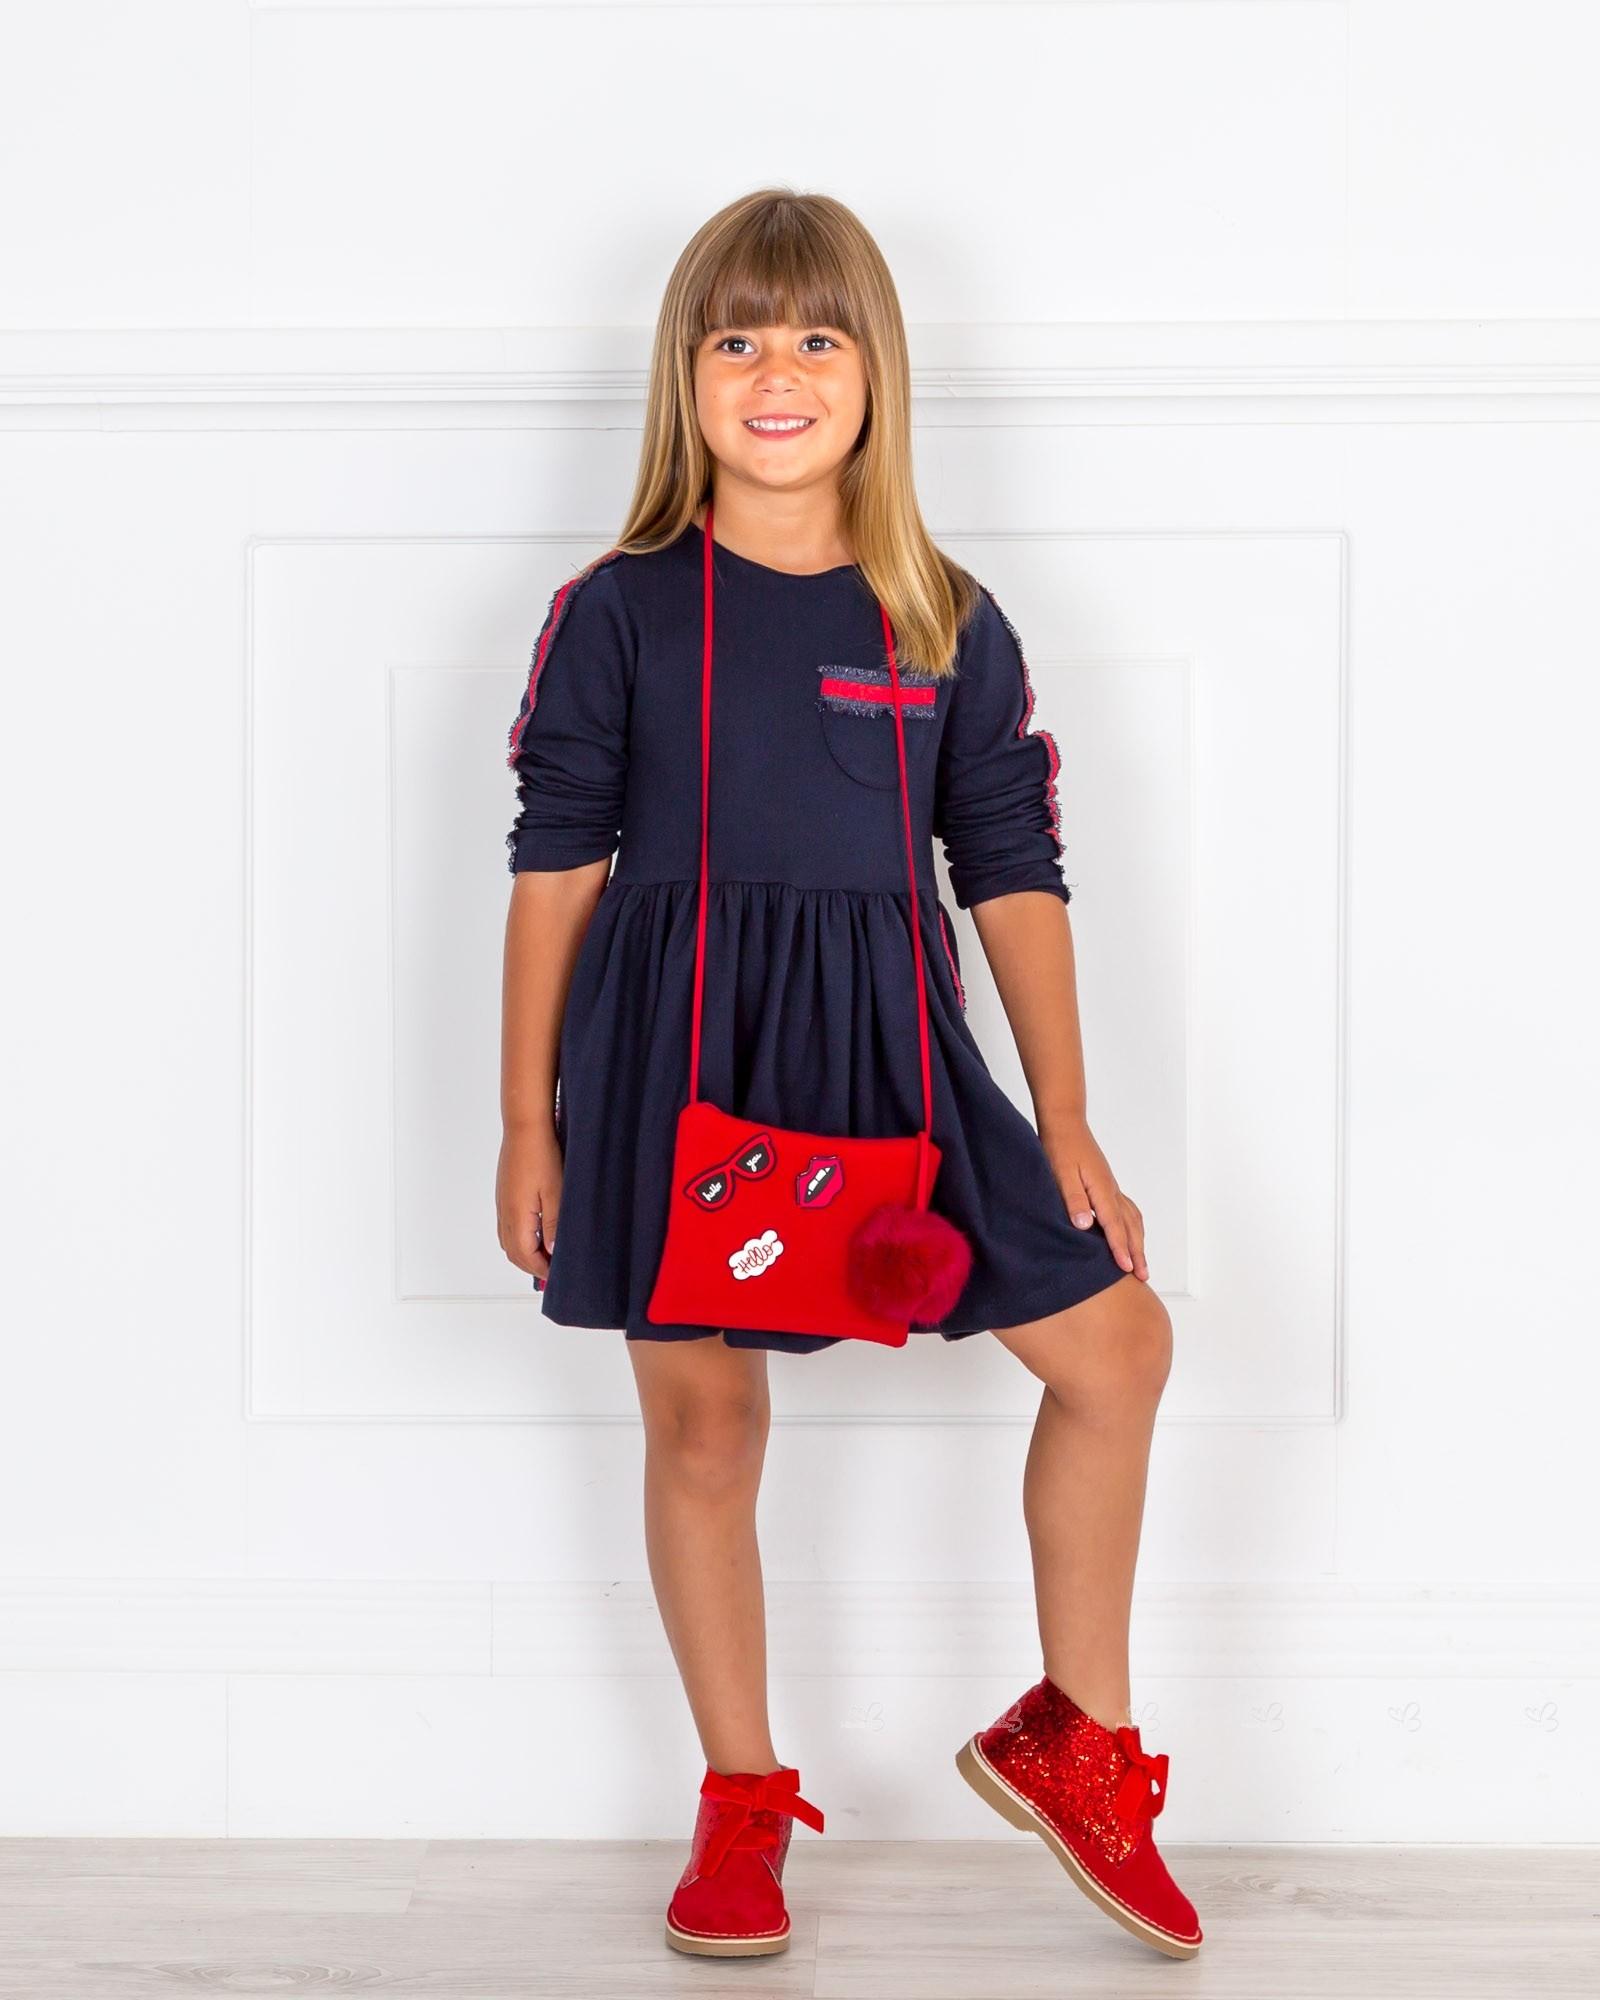 3aa1b3be00 Girls Navy Blue Jersey Dress   Red Glitter Boots Outfit